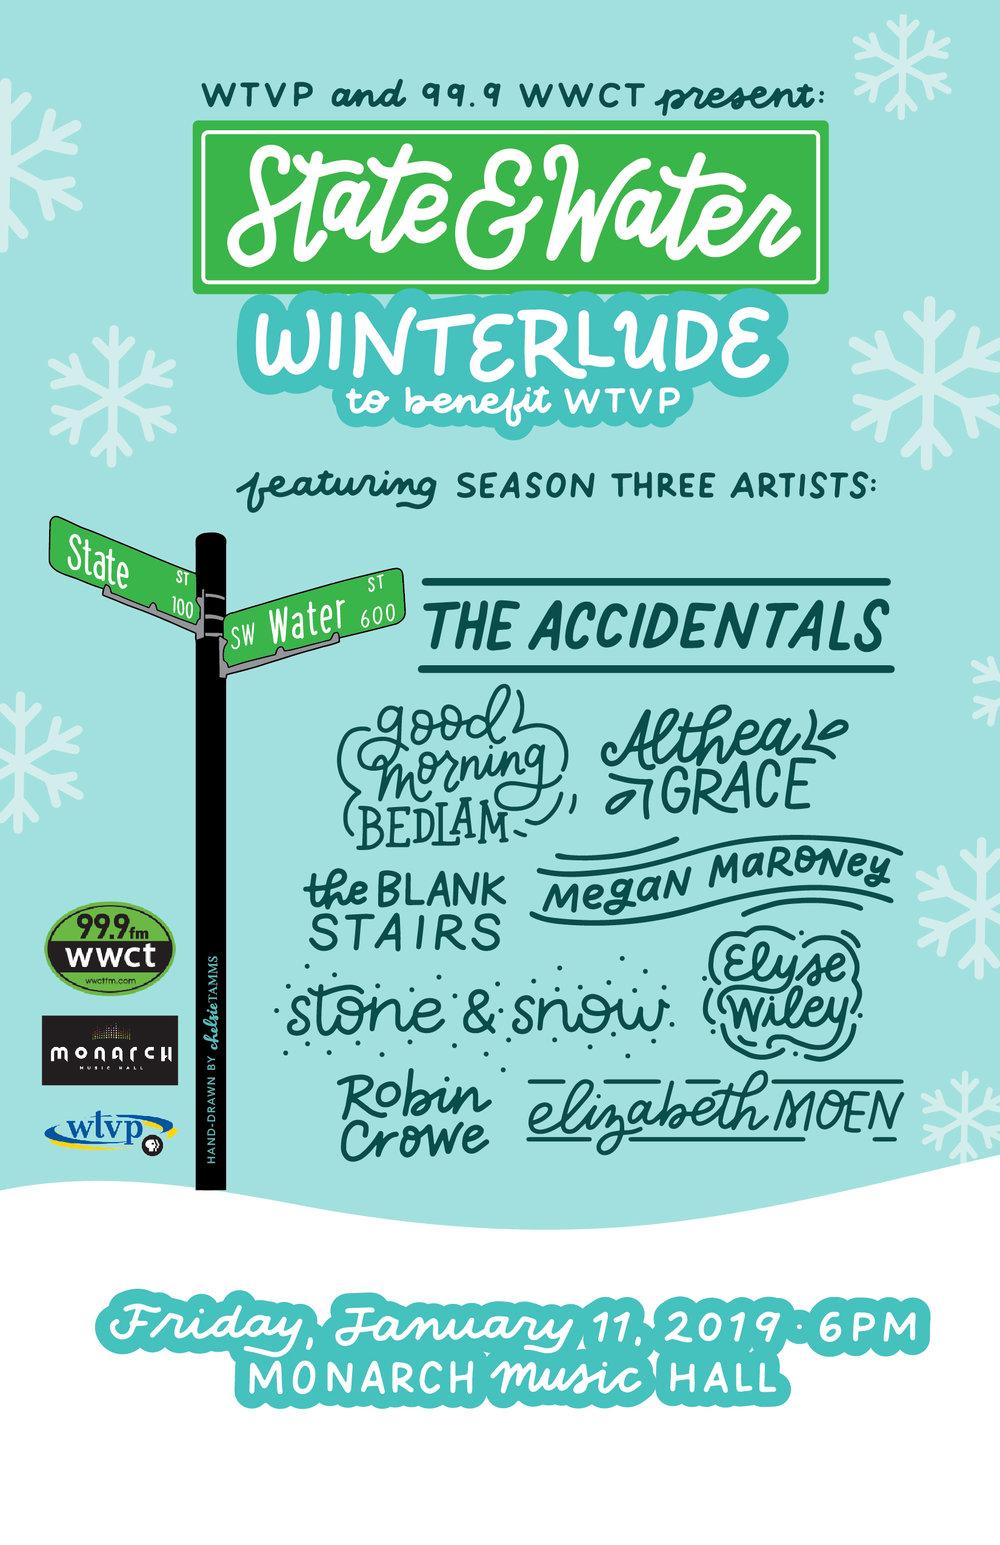 Design for WTVP's Winterlude Benefit